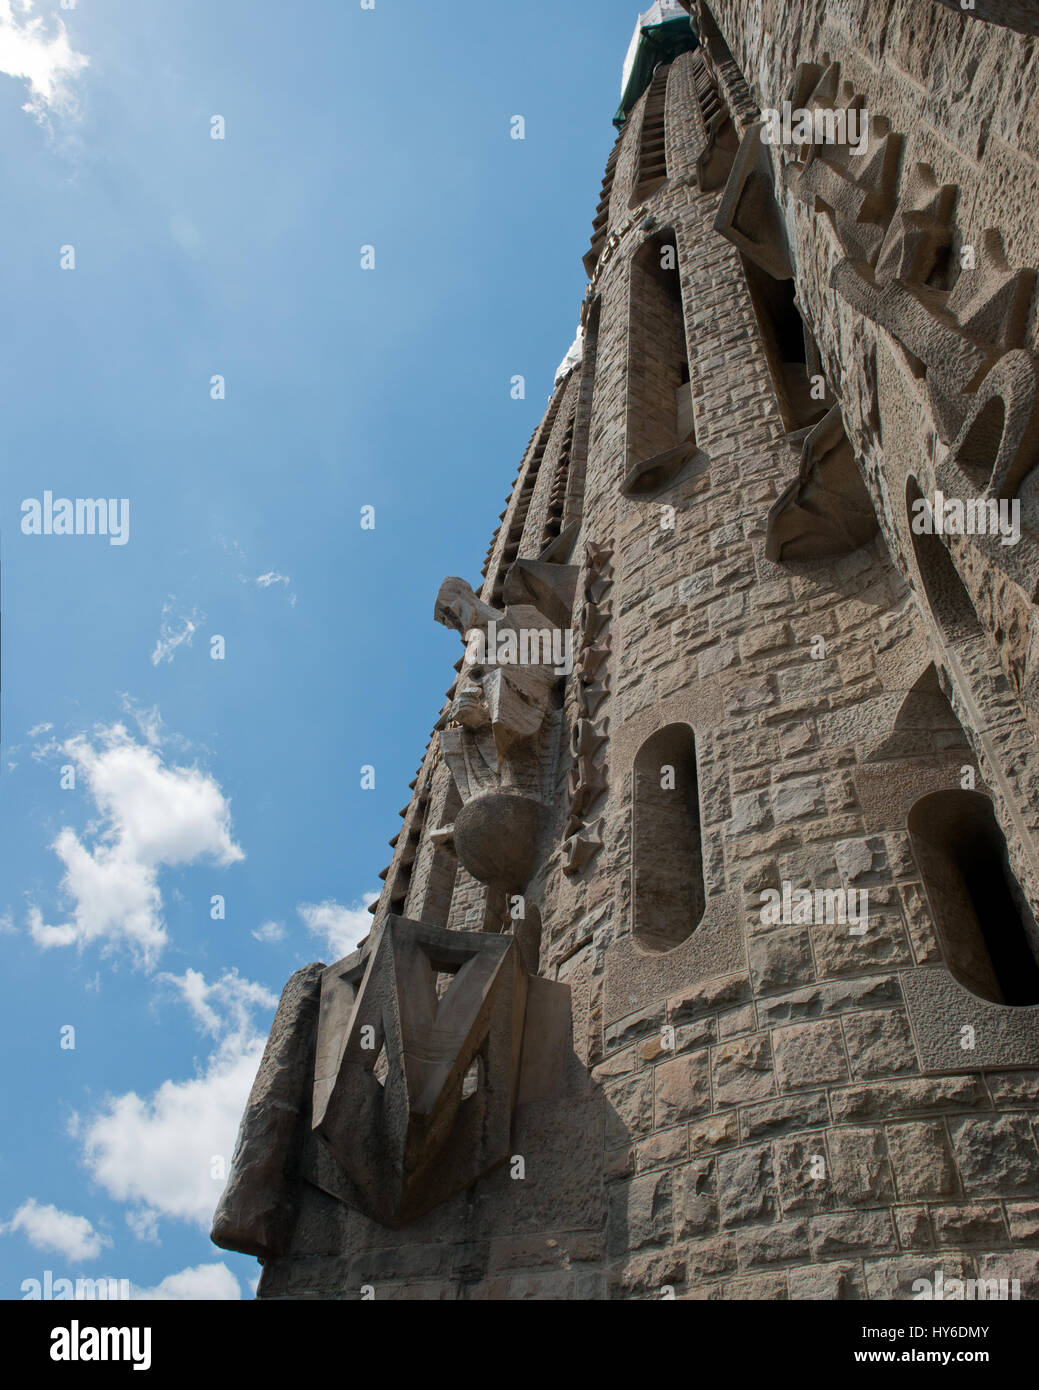 Leidenschaft-Fassade der Sagrada Família Basilika von Antoni Gaudí, UNESCO-Weltkulturerbe, Barcelona, Stockbild